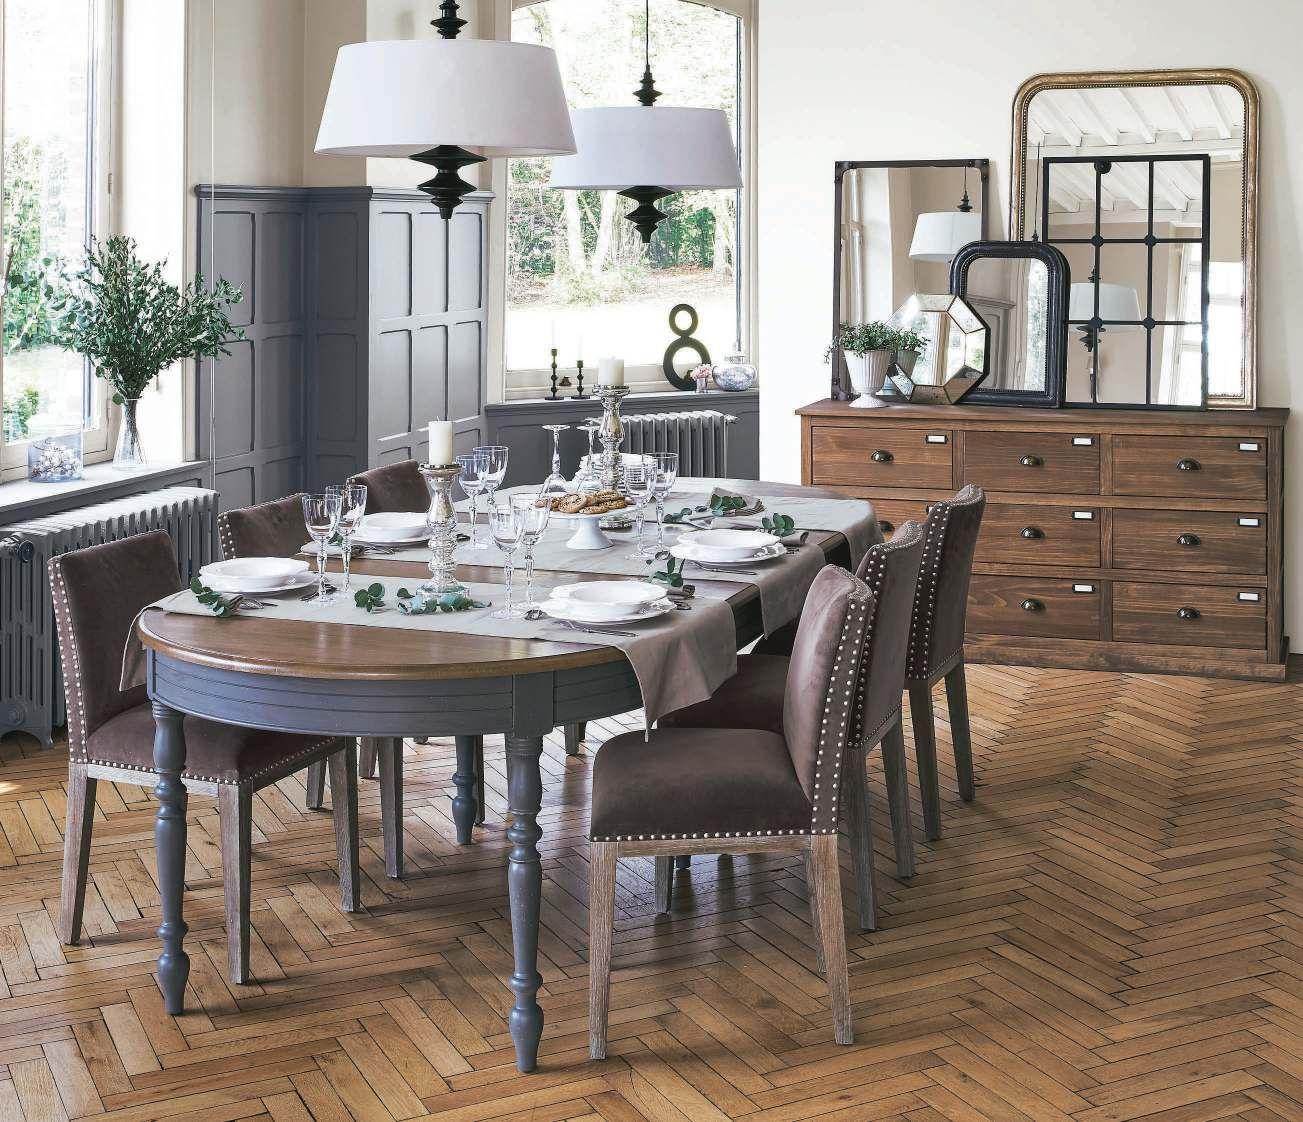 collection ah 2017 2018 catalogue la redoute int rieurs. Black Bedroom Furniture Sets. Home Design Ideas